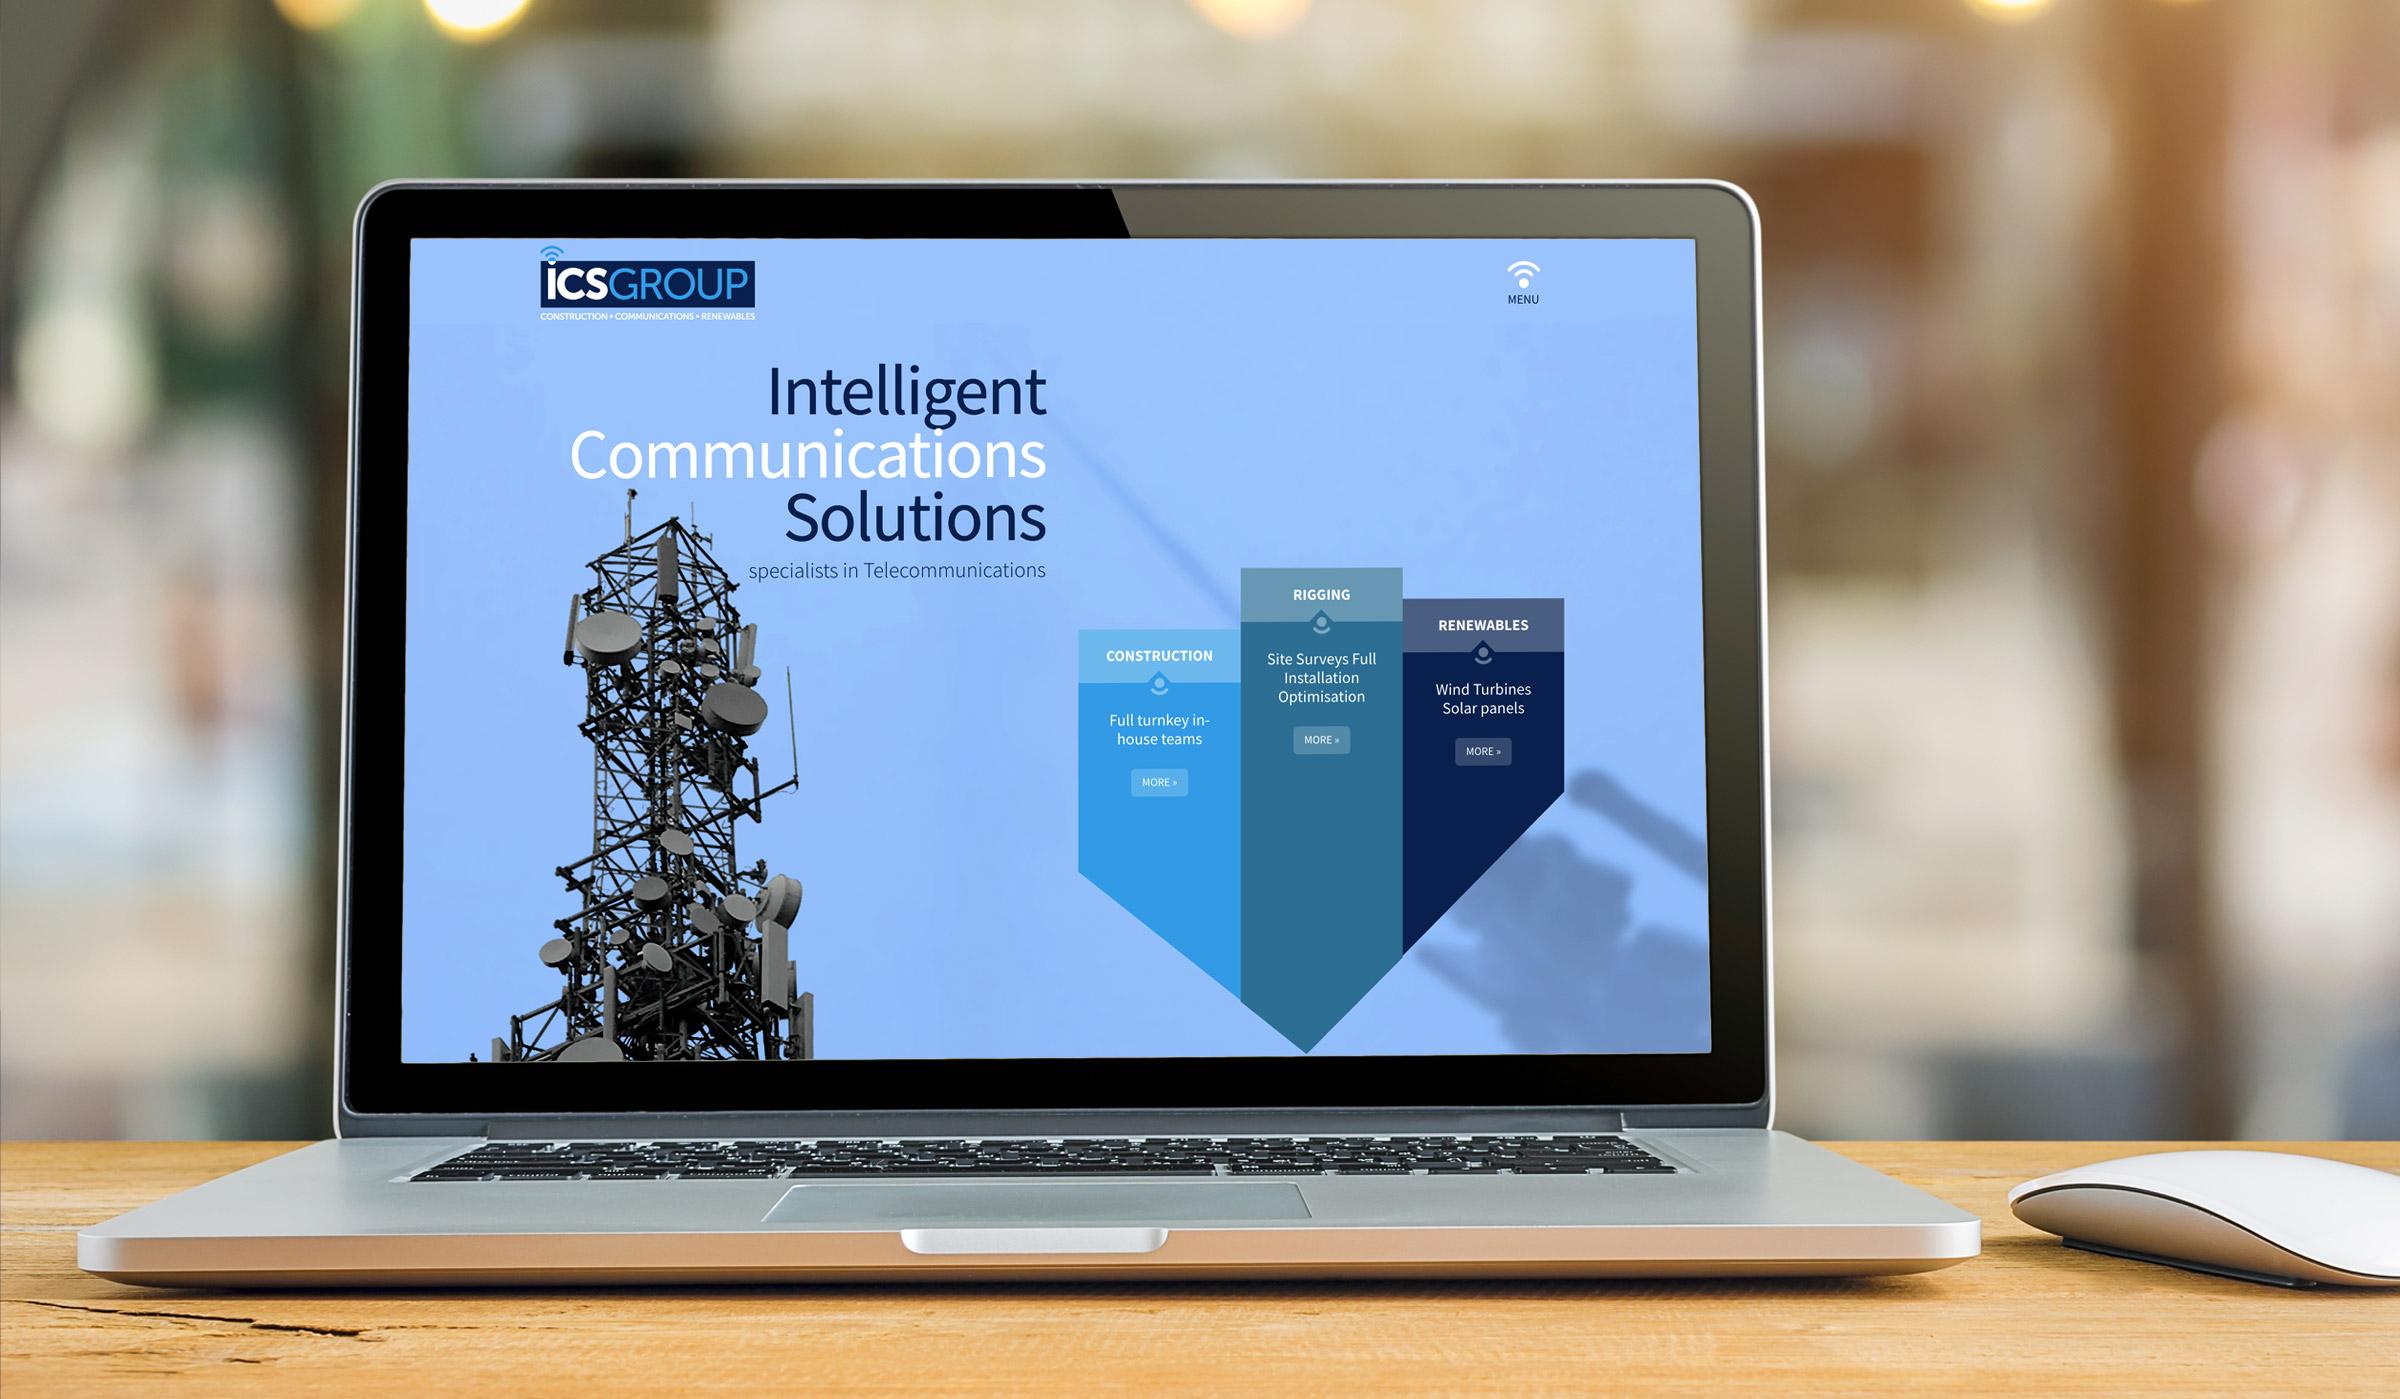 ICS Group website design